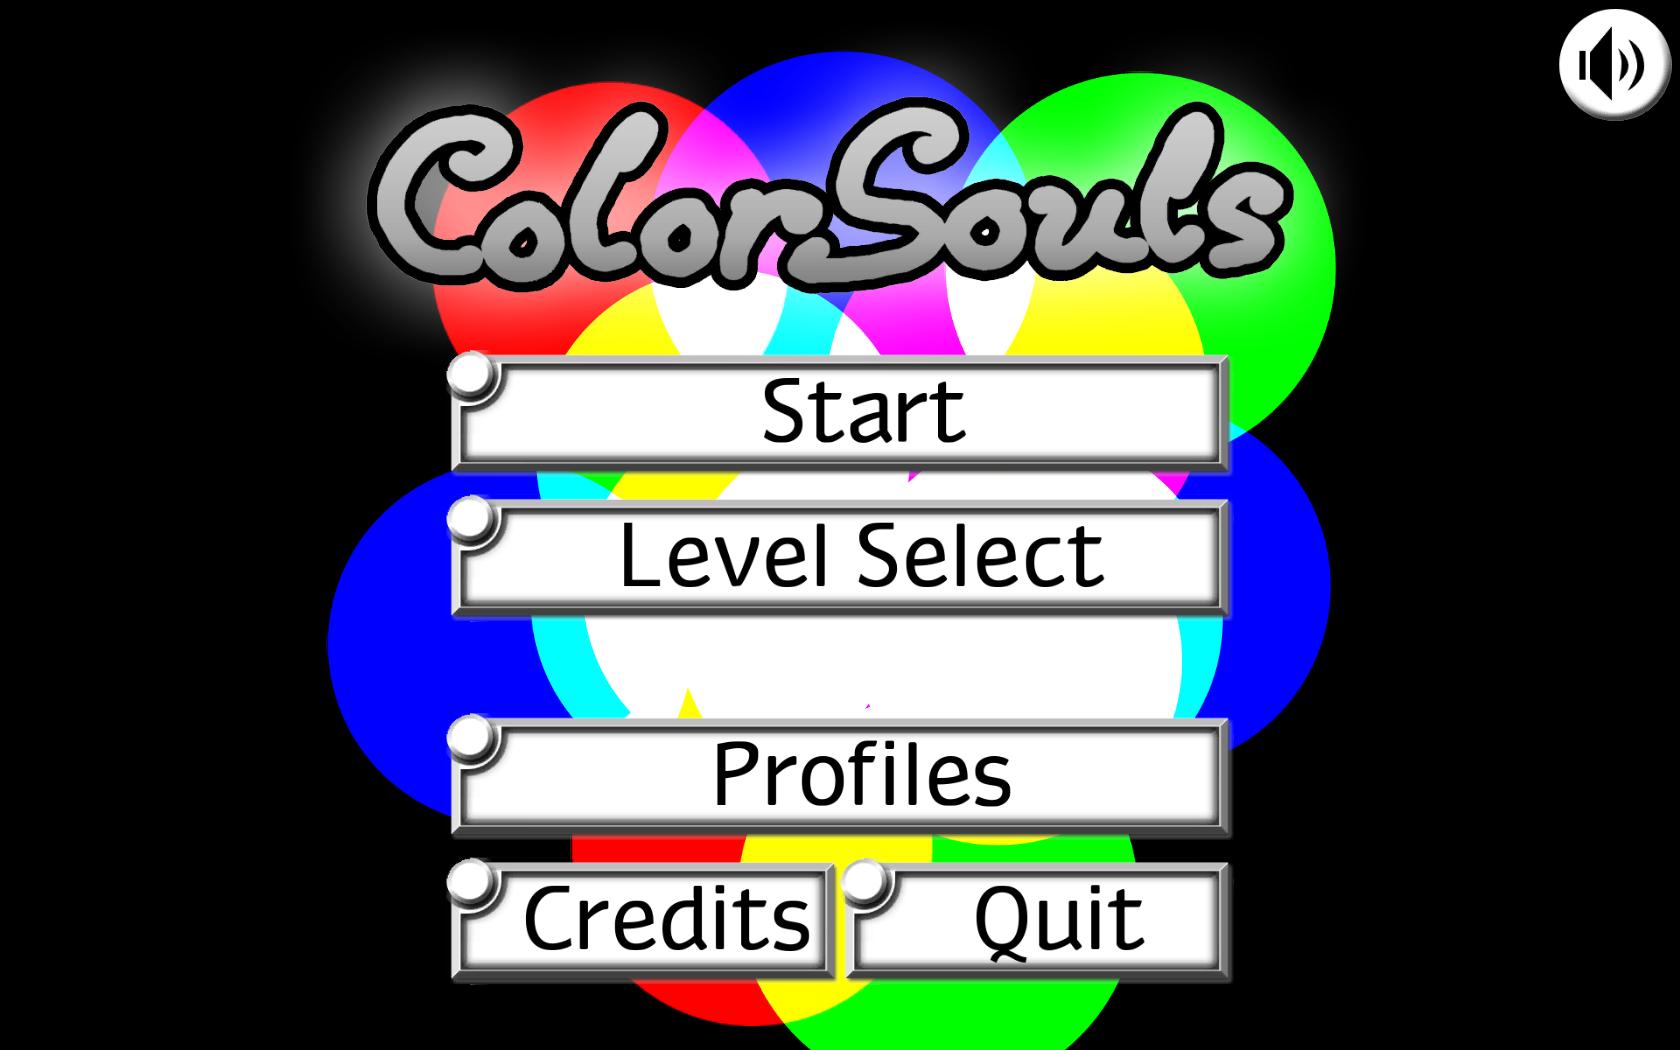 Color Souls